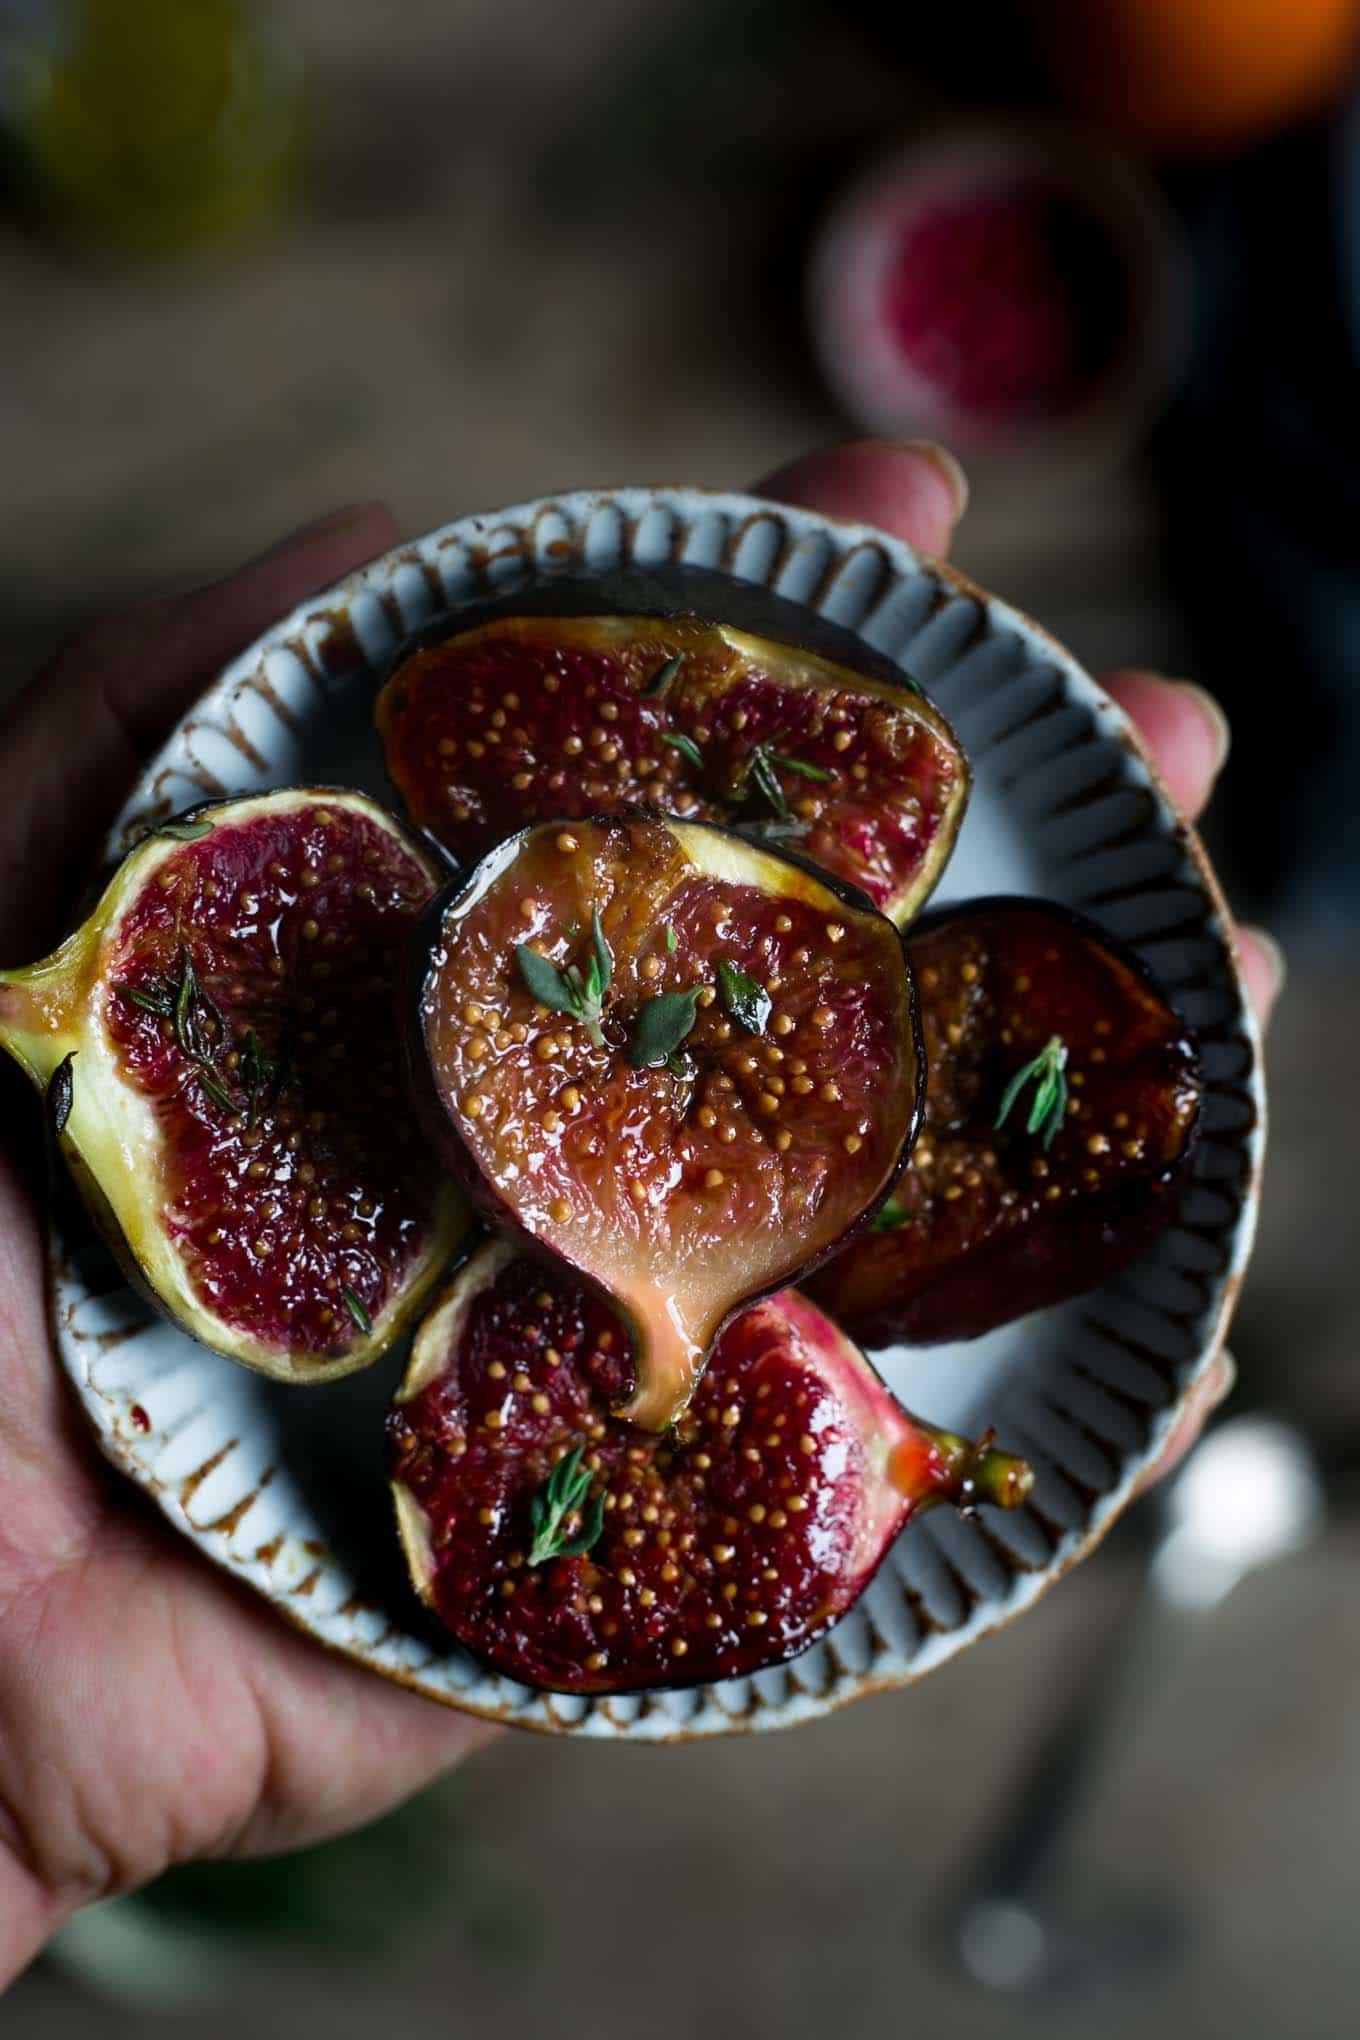 Roasted pumpkin salad with figs and walnuts #vegan #pumpkin #figs   via @annabanana.co